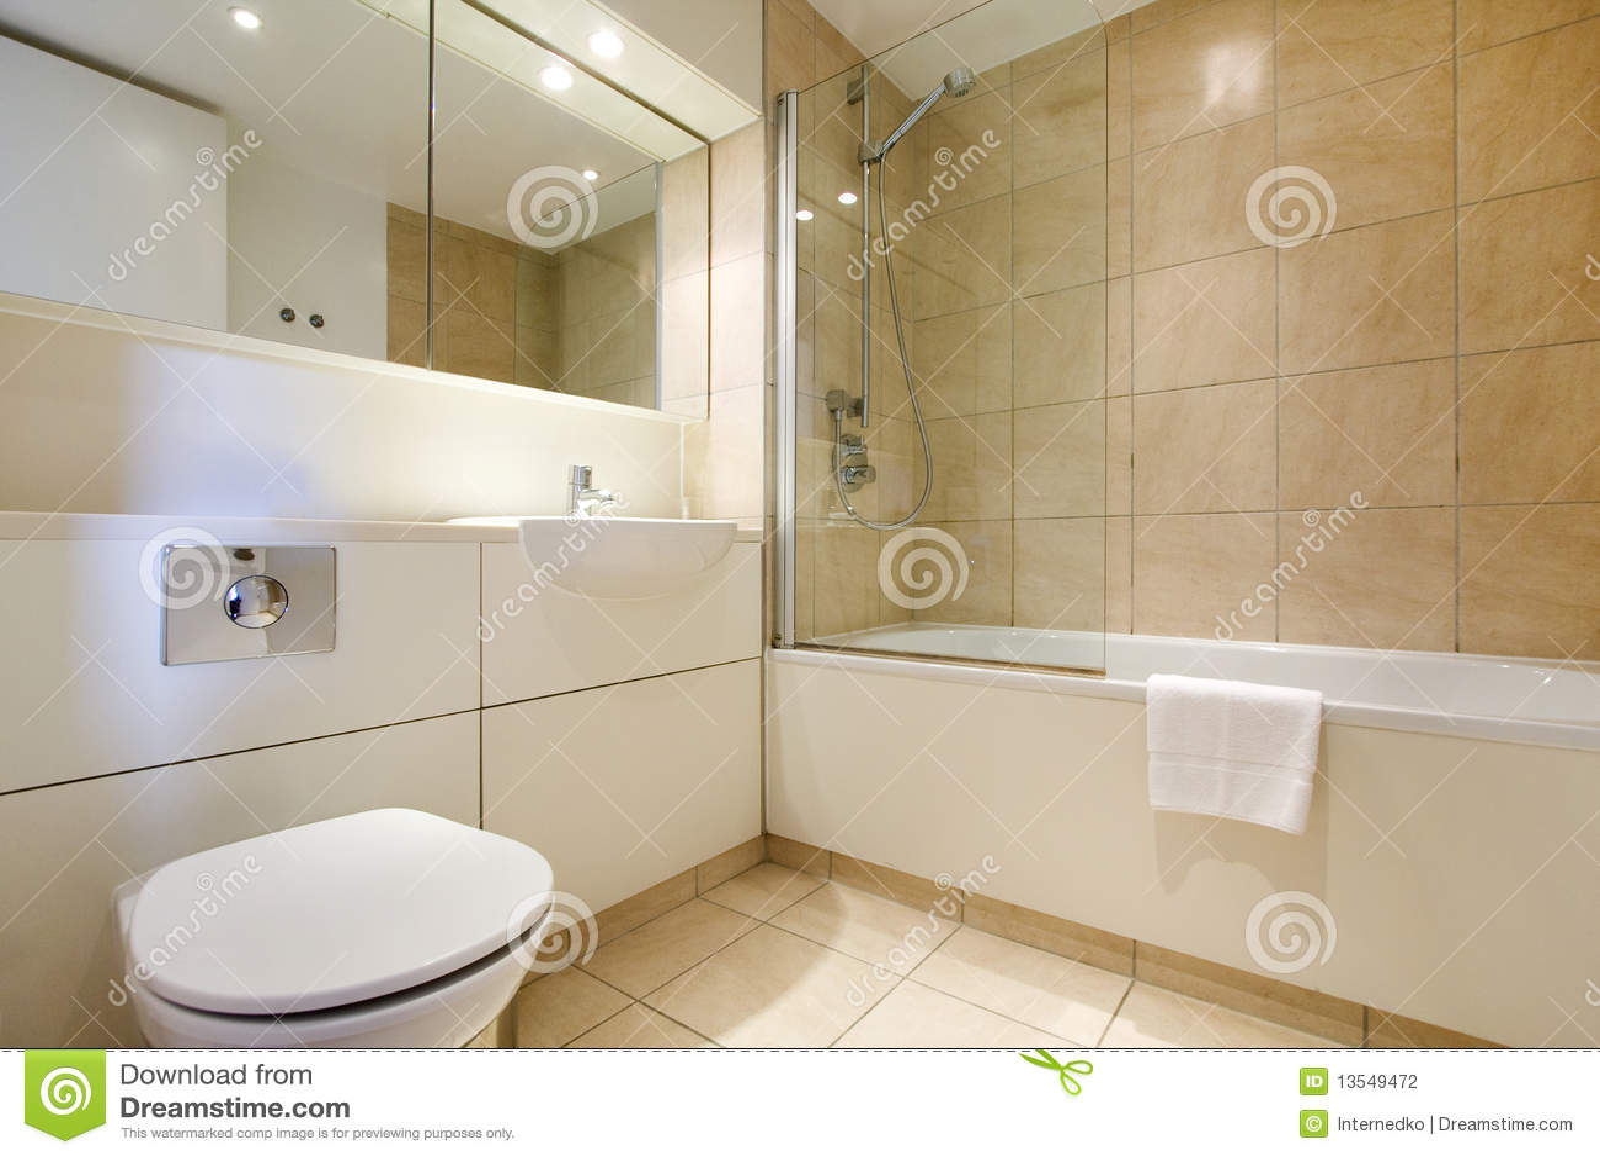 Simple Bathroom Interior London Stock Photo Image Of Towel White 13549472